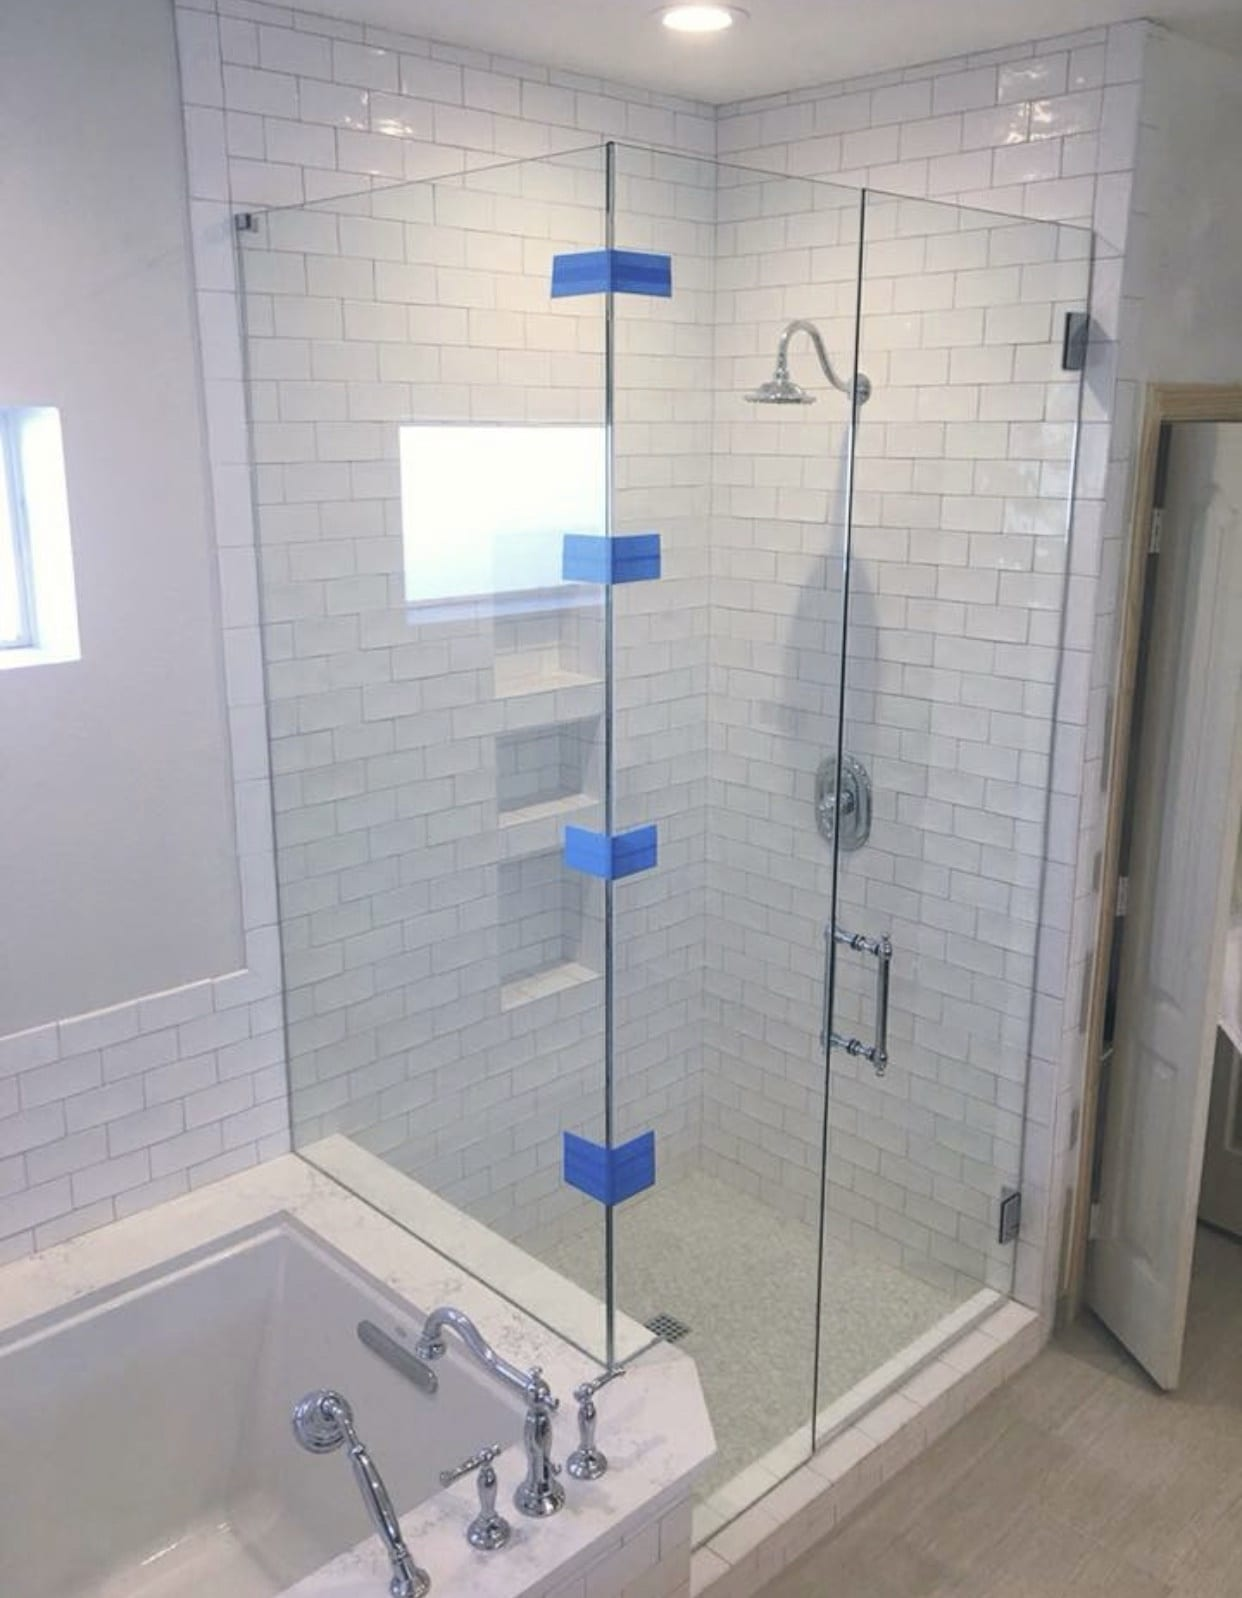 frameless shower doors img 2166 custom bathroom mirrors and decorative glass from Shower Doors of Nashville